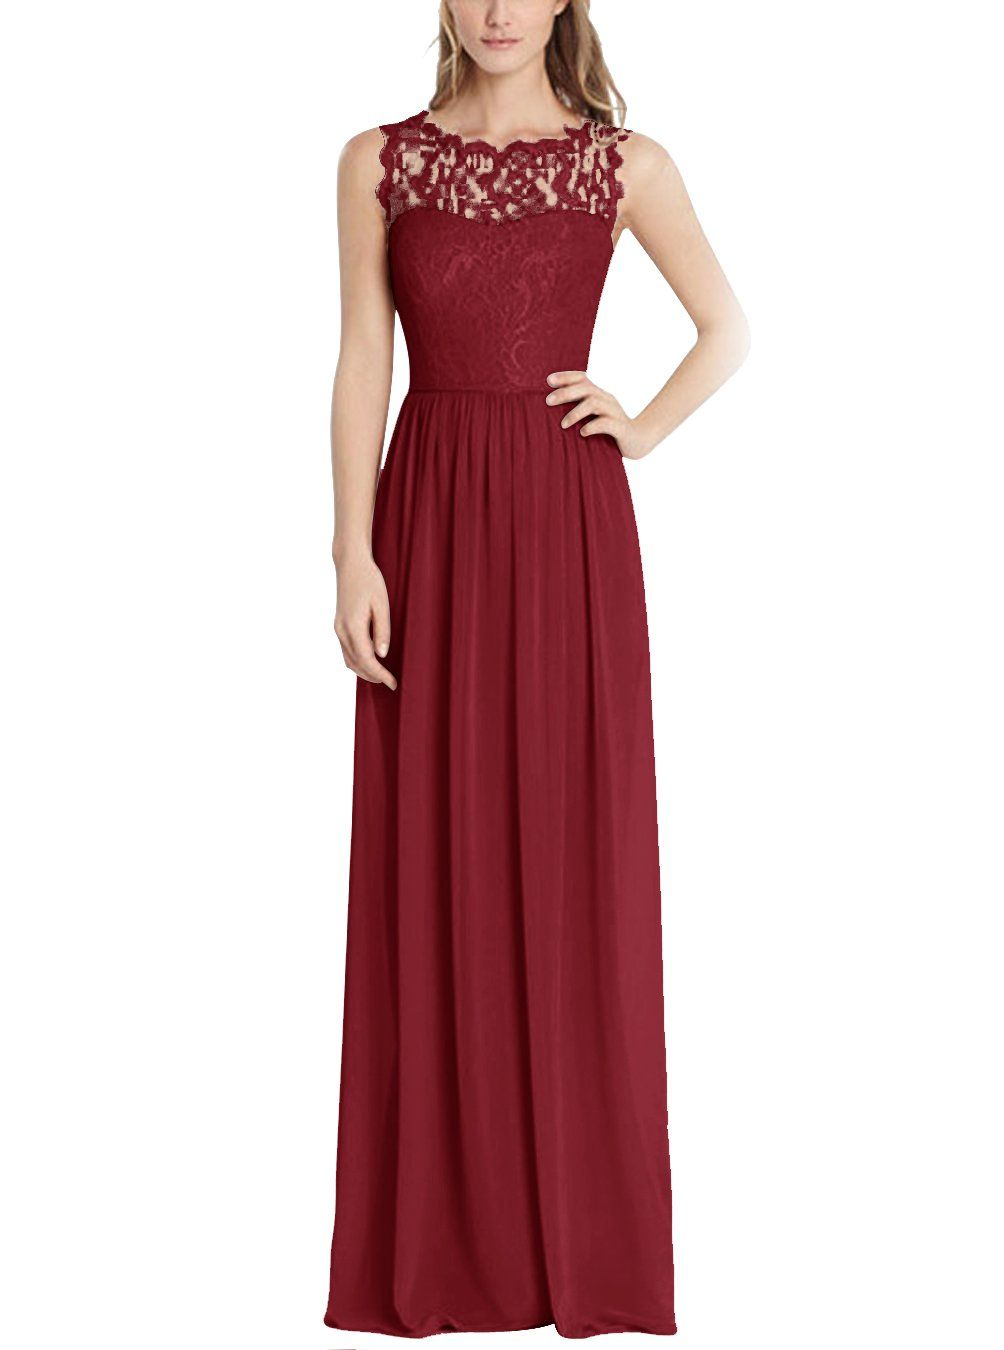 Tideclothes long chiffon bridesmaid dress lace seethrough prom